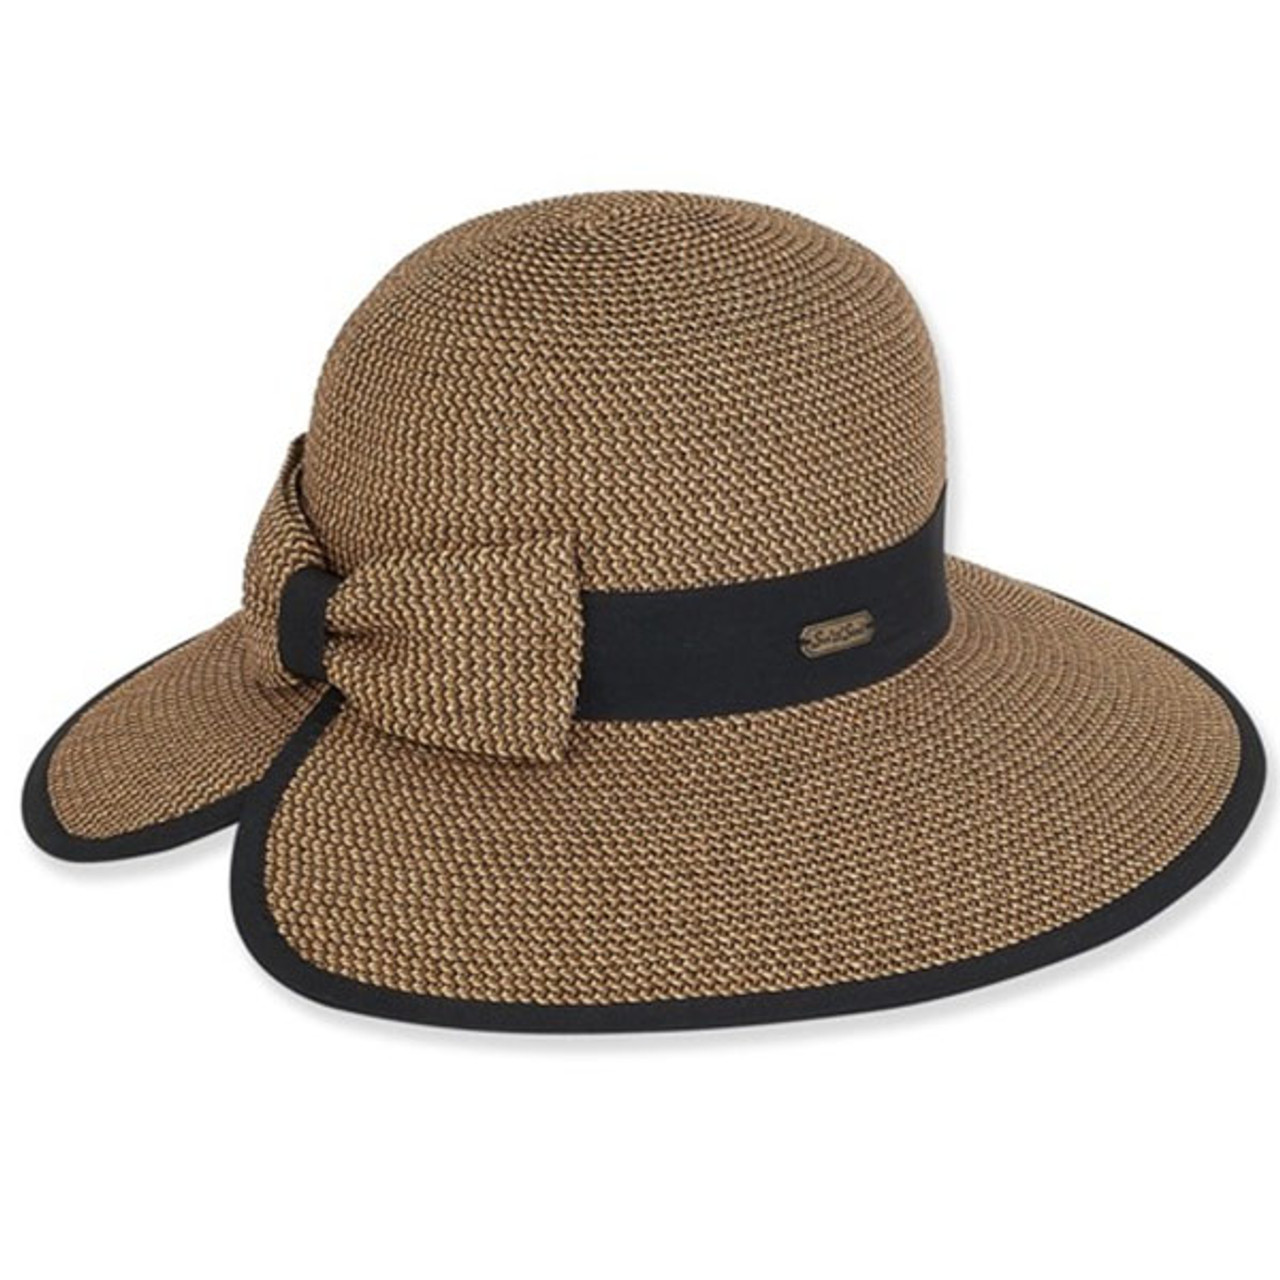 d48901567 Sun 'N' Sand - Braided Short Back Hat